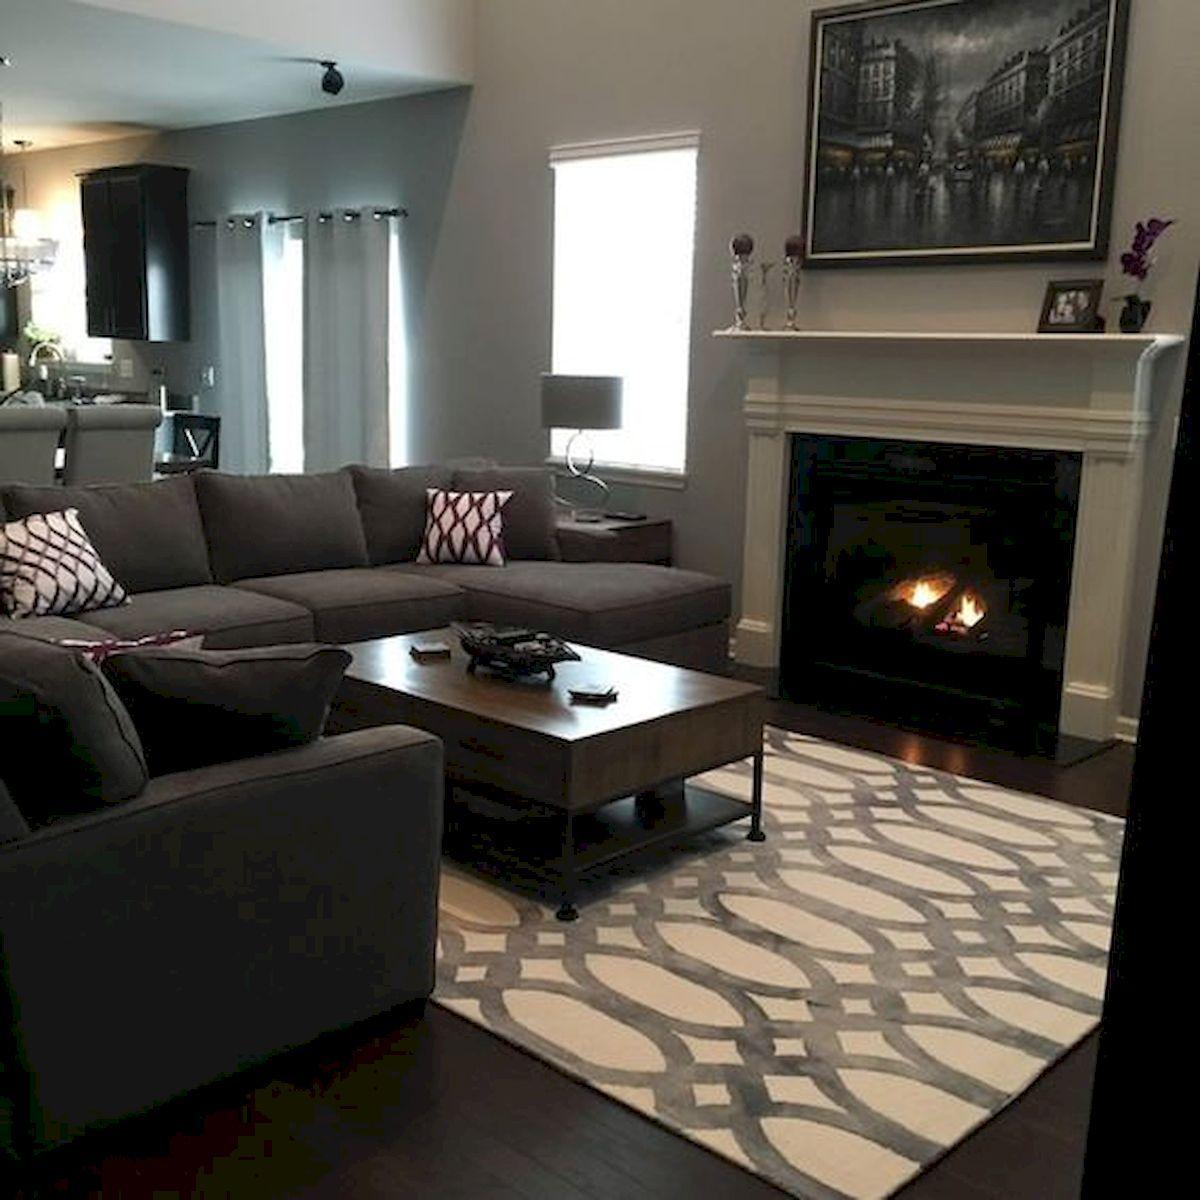 33 Modern Living Room Design Ideas: 33 Inspiring Modern Farmhouse Rugs Decor Ideas And Design